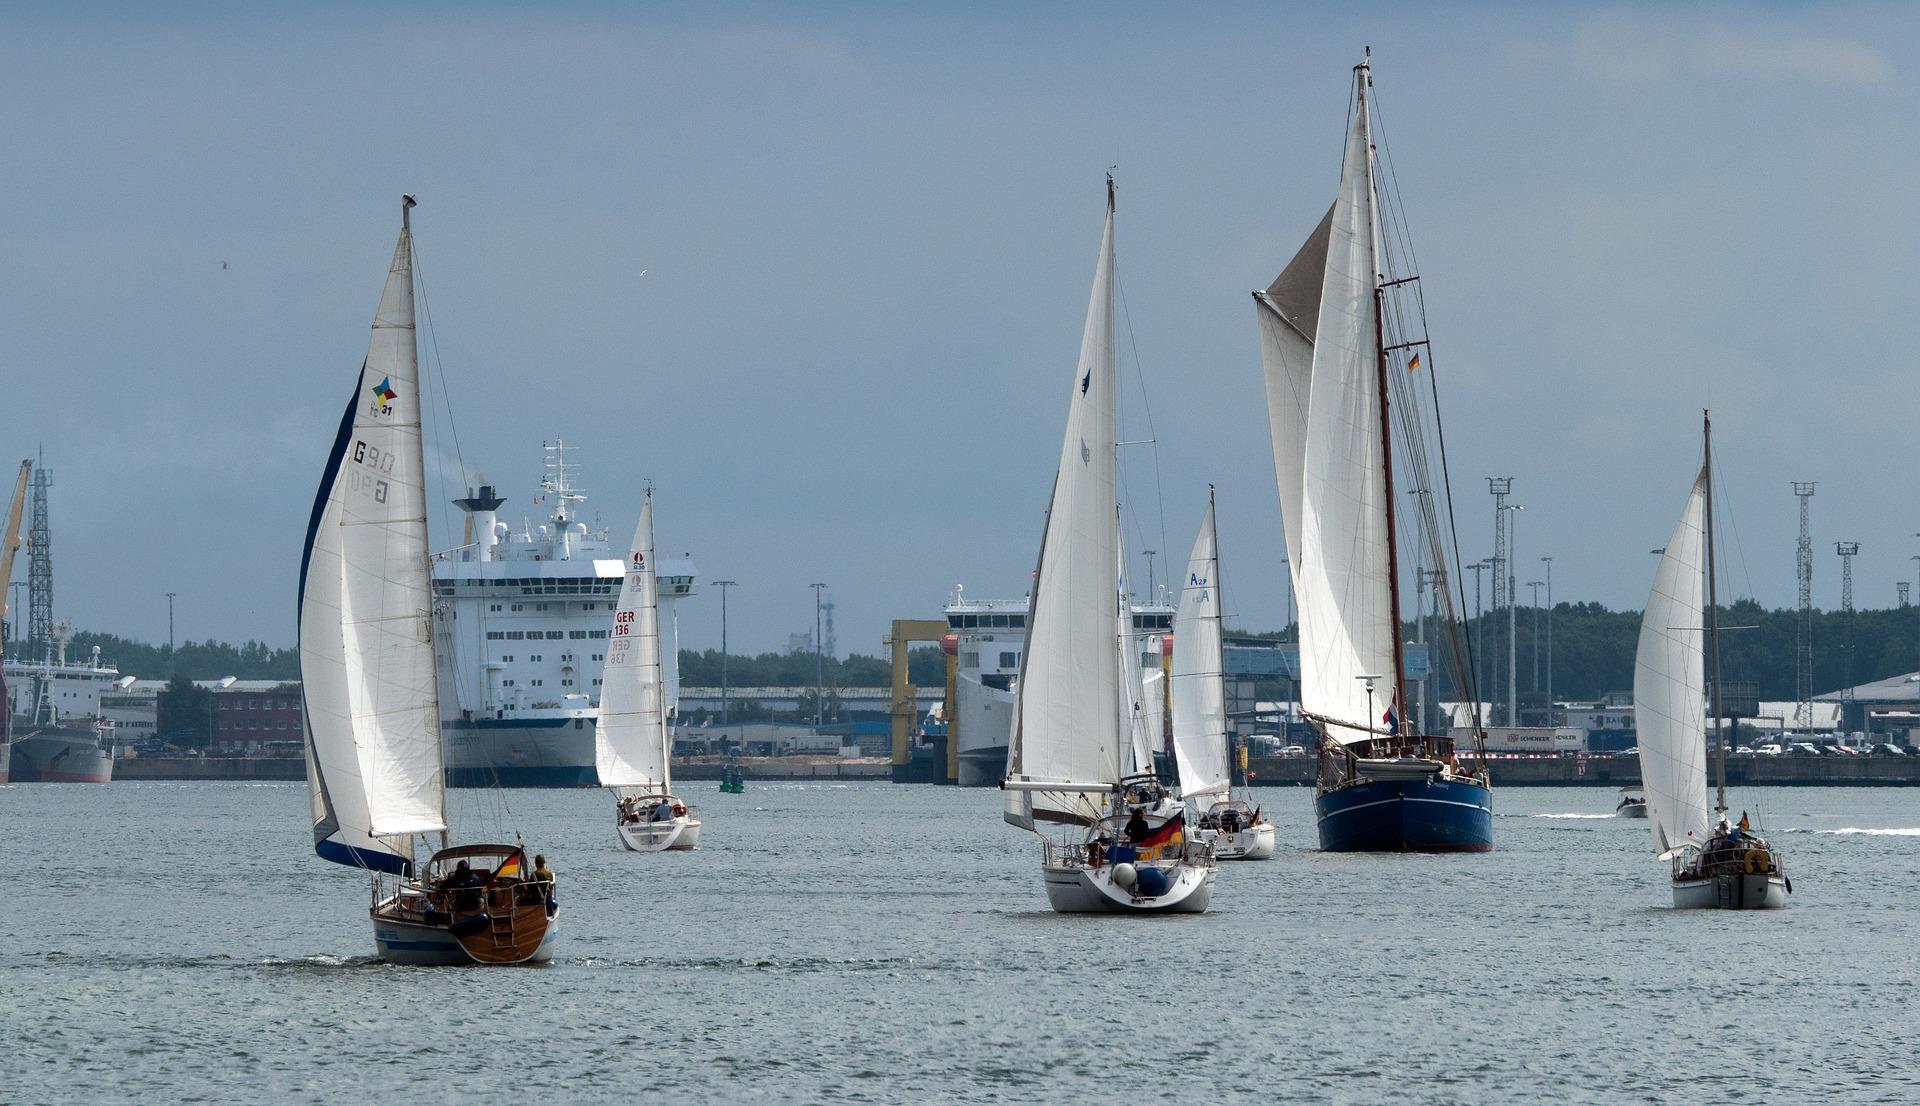 sailing-ships-4443273_1920.jpg